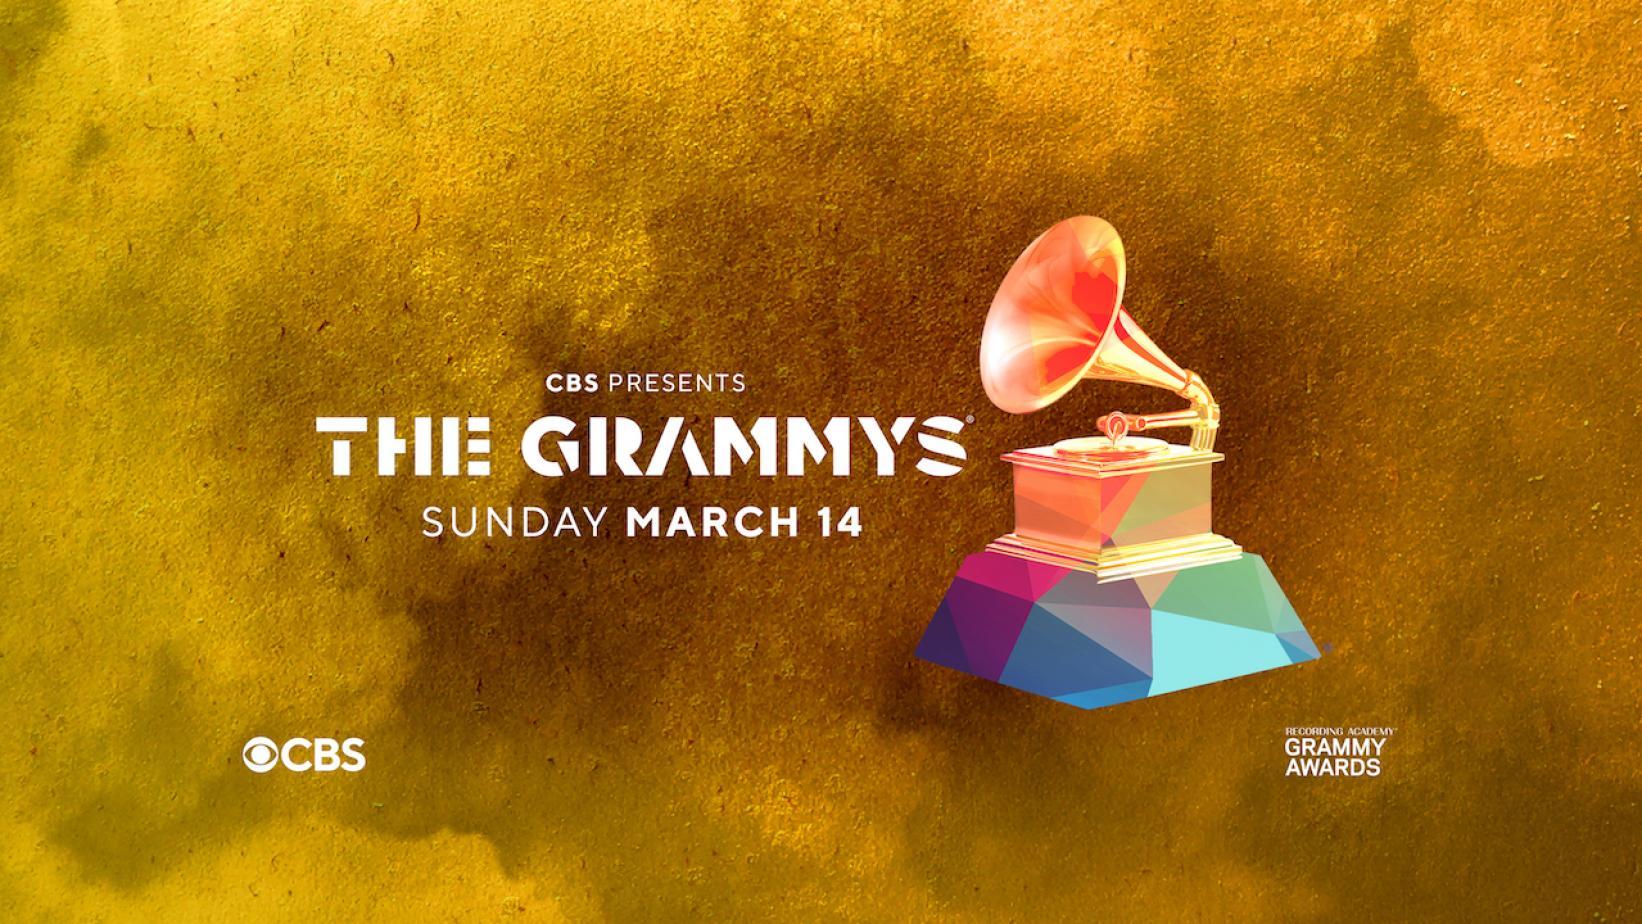 The Grammy Awards 2021